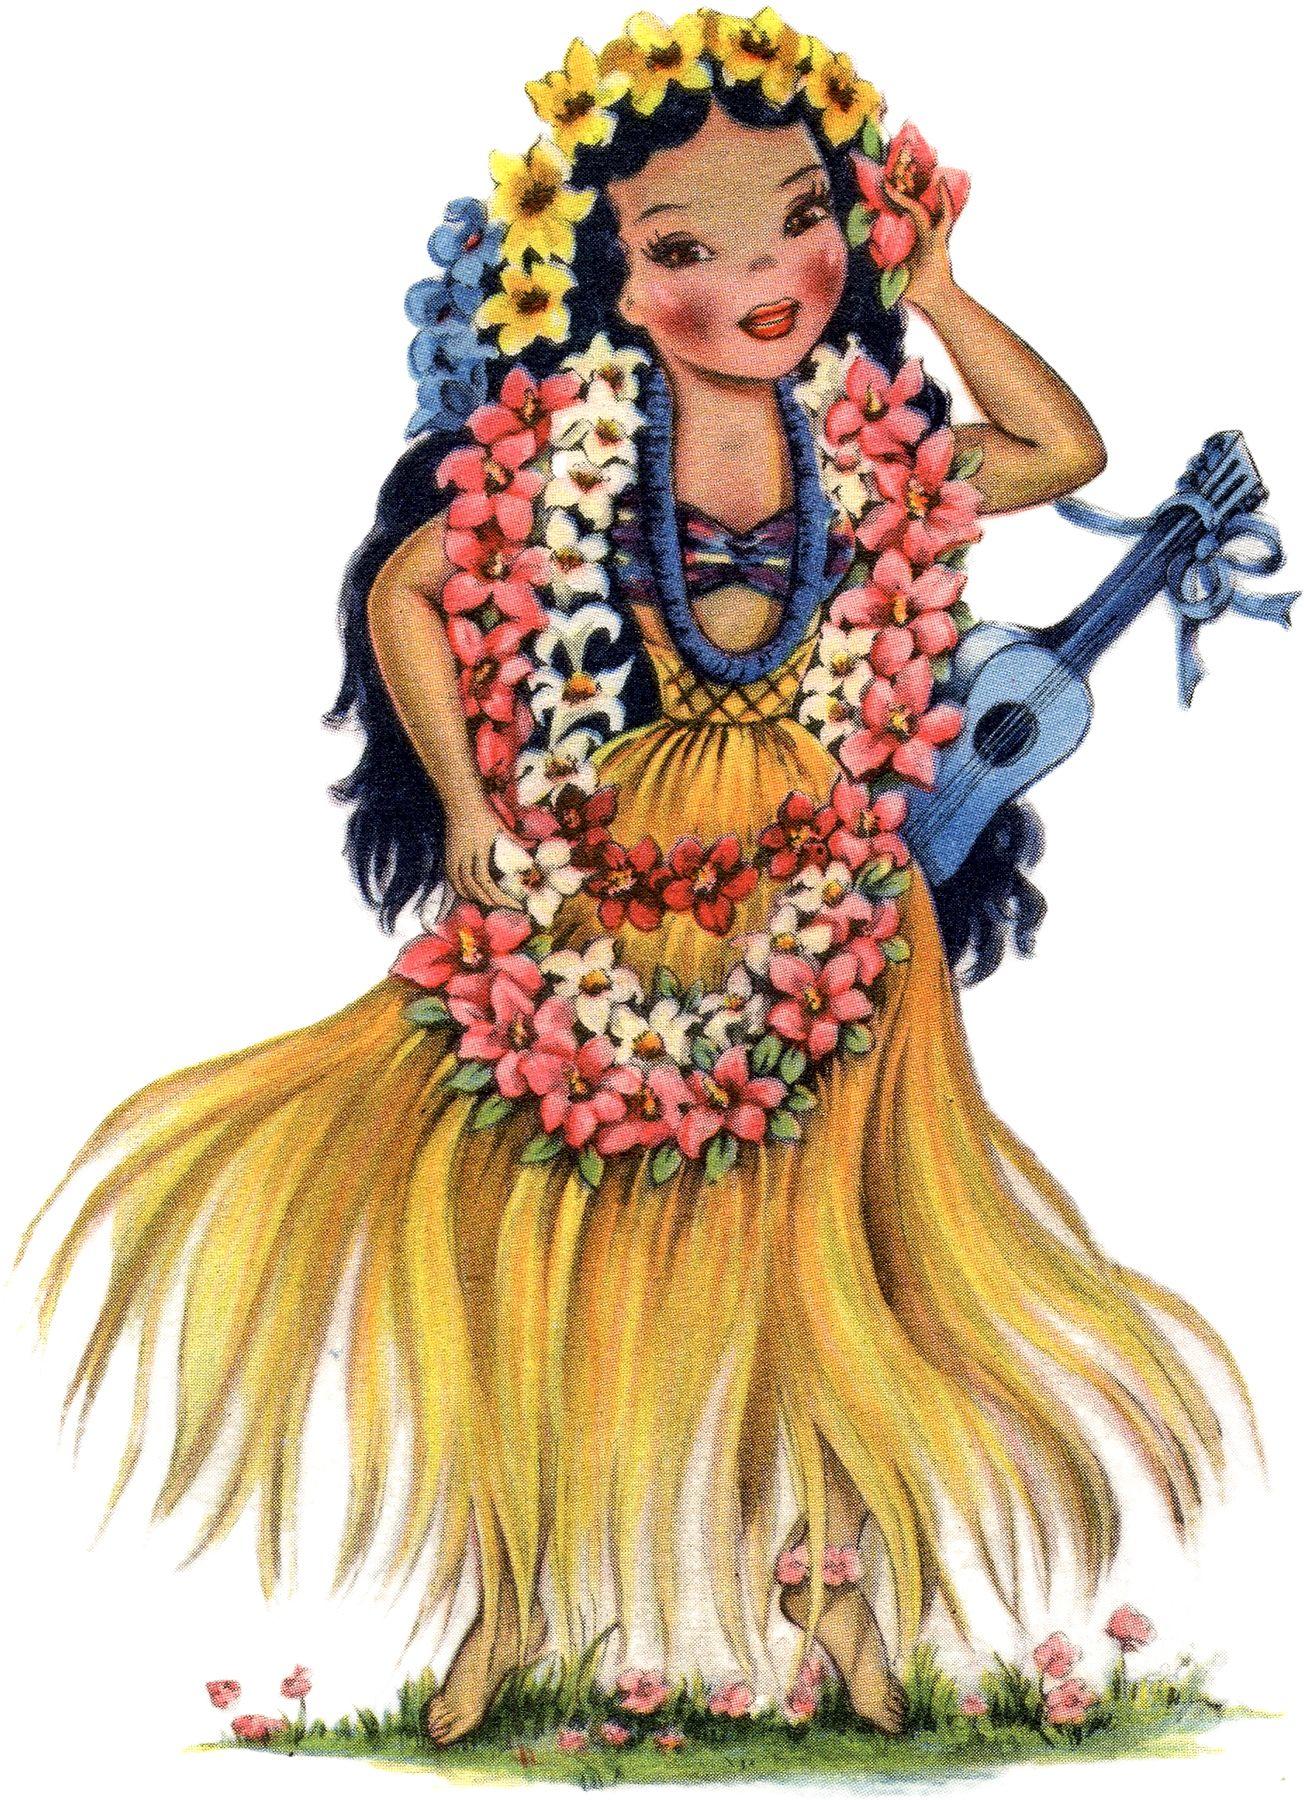 Vintage hawaiian clipart graphic freeuse library Retro Hawaiian Doll Image | Dolls of Many Lands | Vintage ... graphic freeuse library